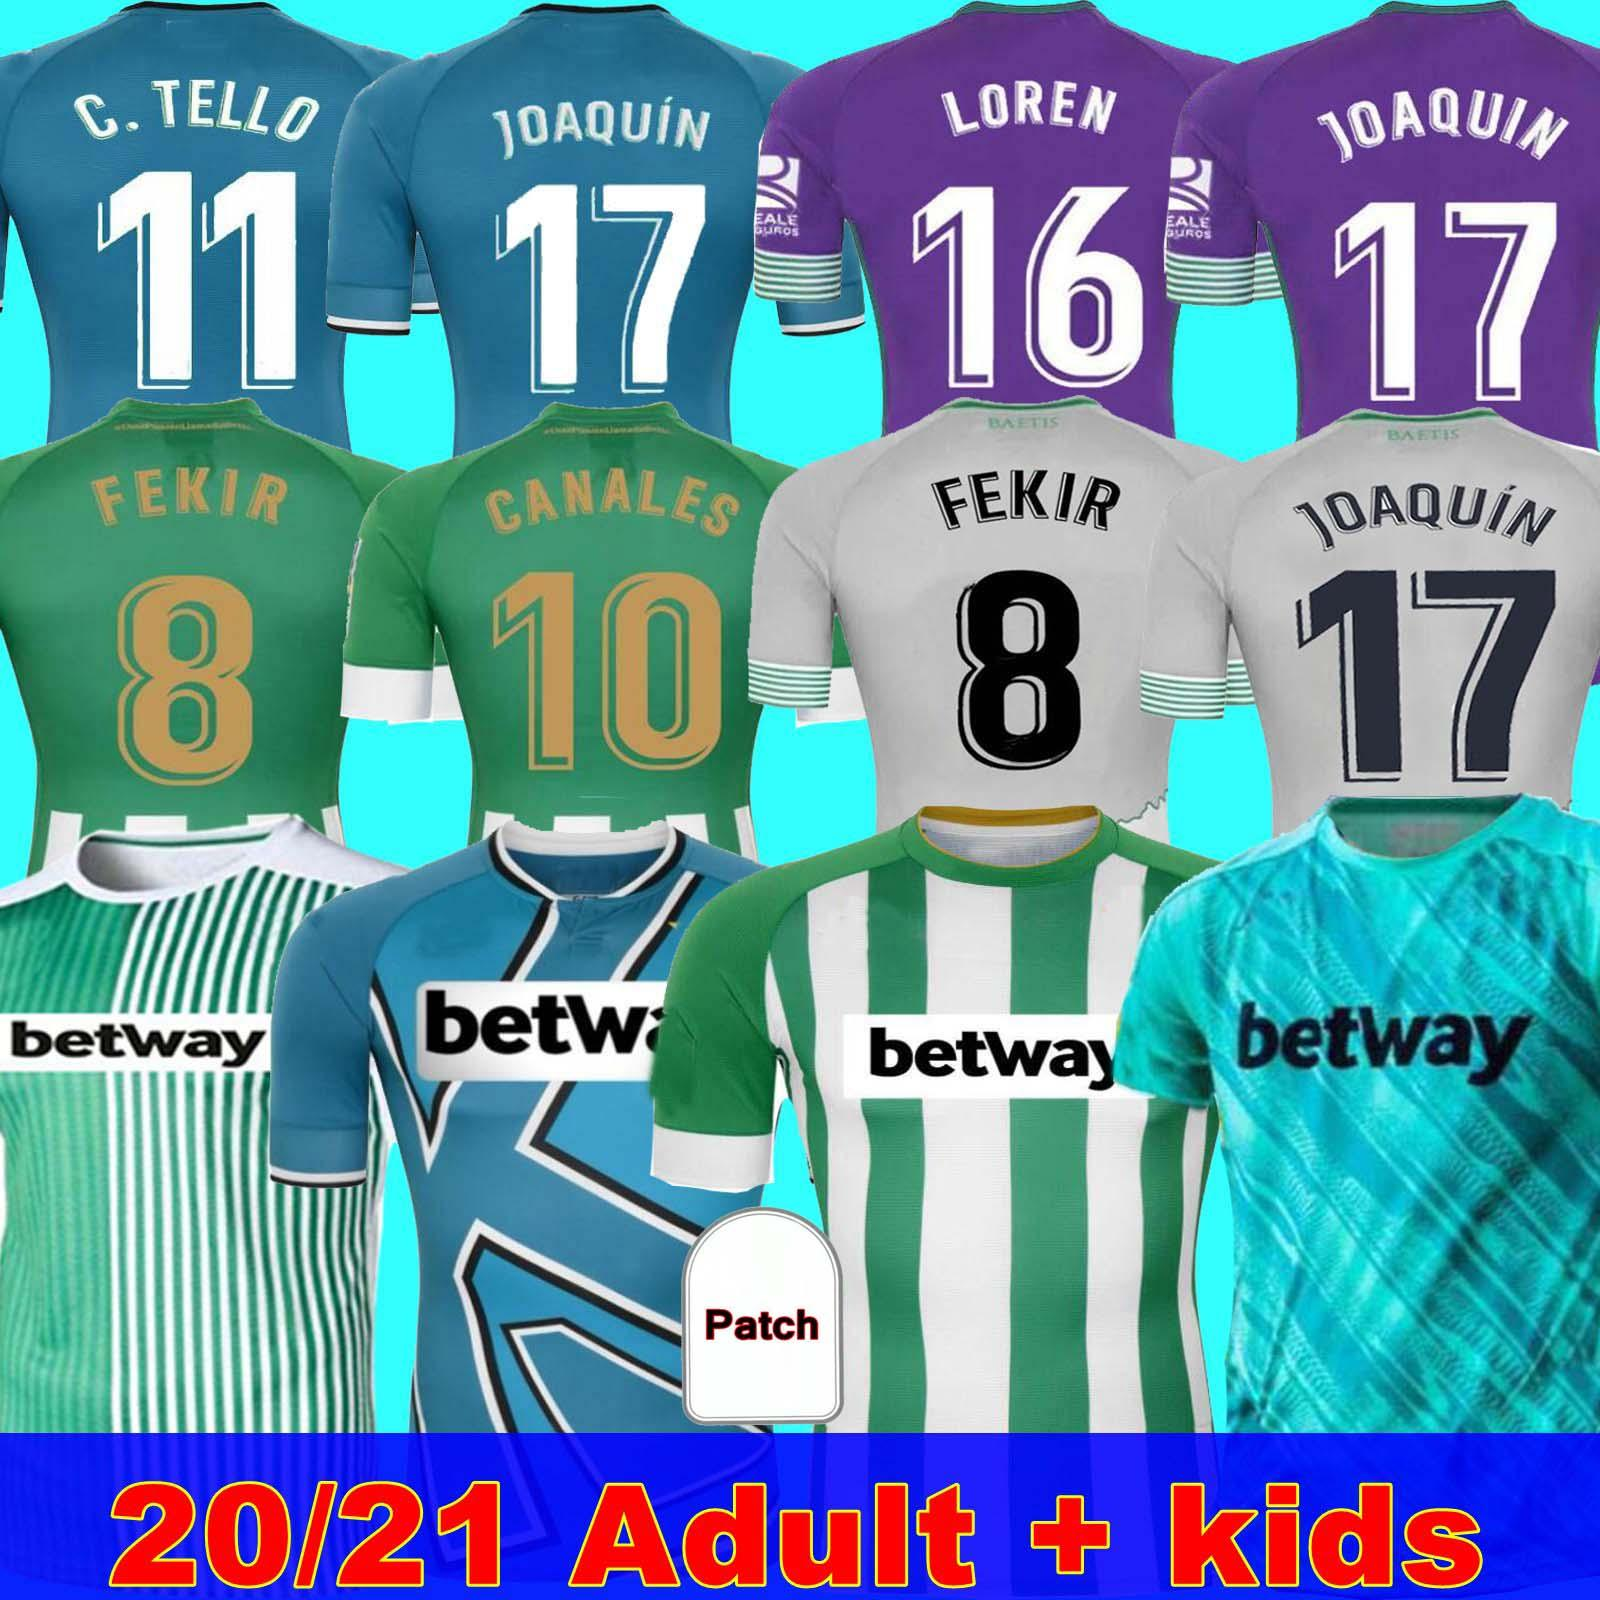 Camiseta de fútbol MAN + KIDS 20 21 Real Betis JOAQUIN Loren Boudebouz MANDI BARTRA TELLO GARCIA CANALES edición conmemorativa Fekir 8